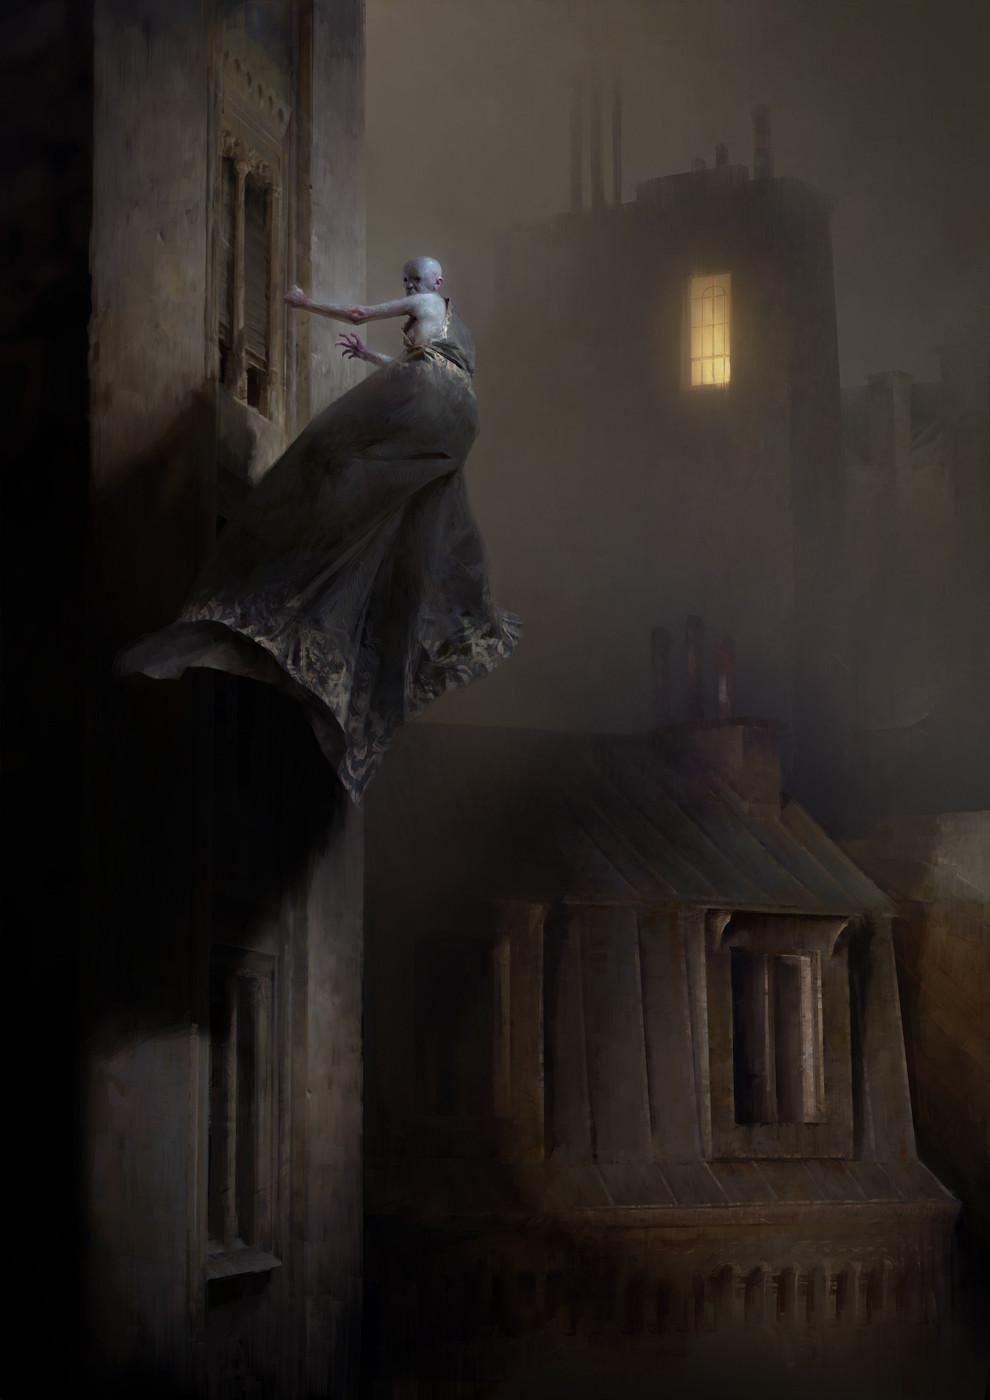 piotr-jablonski-knocker-at-the-window-serkonan-legends-s.jpg